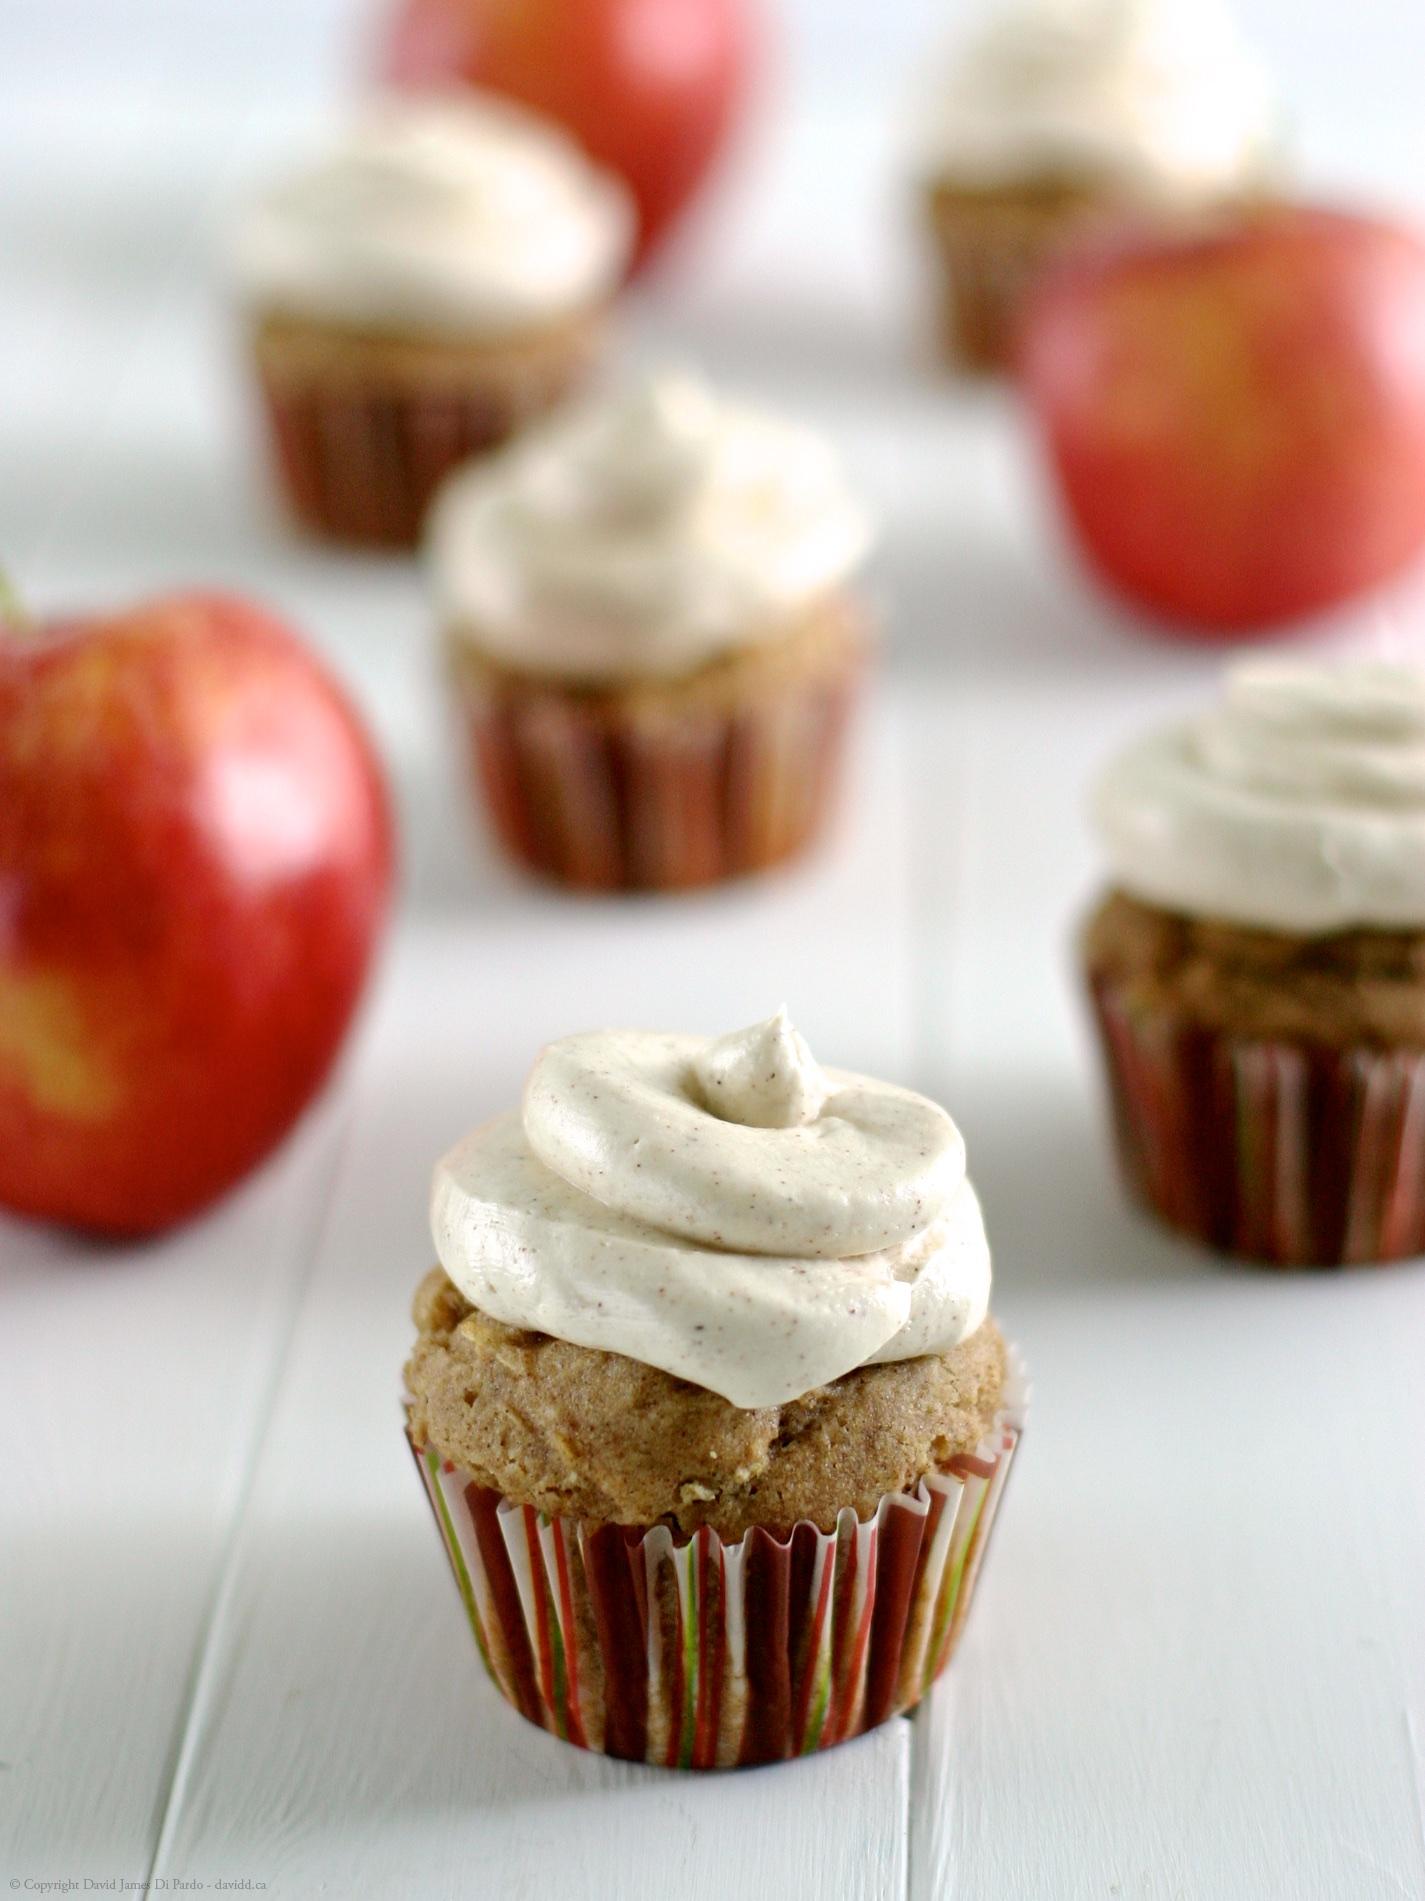 Apple and Cinnamon Cupcake Recipe